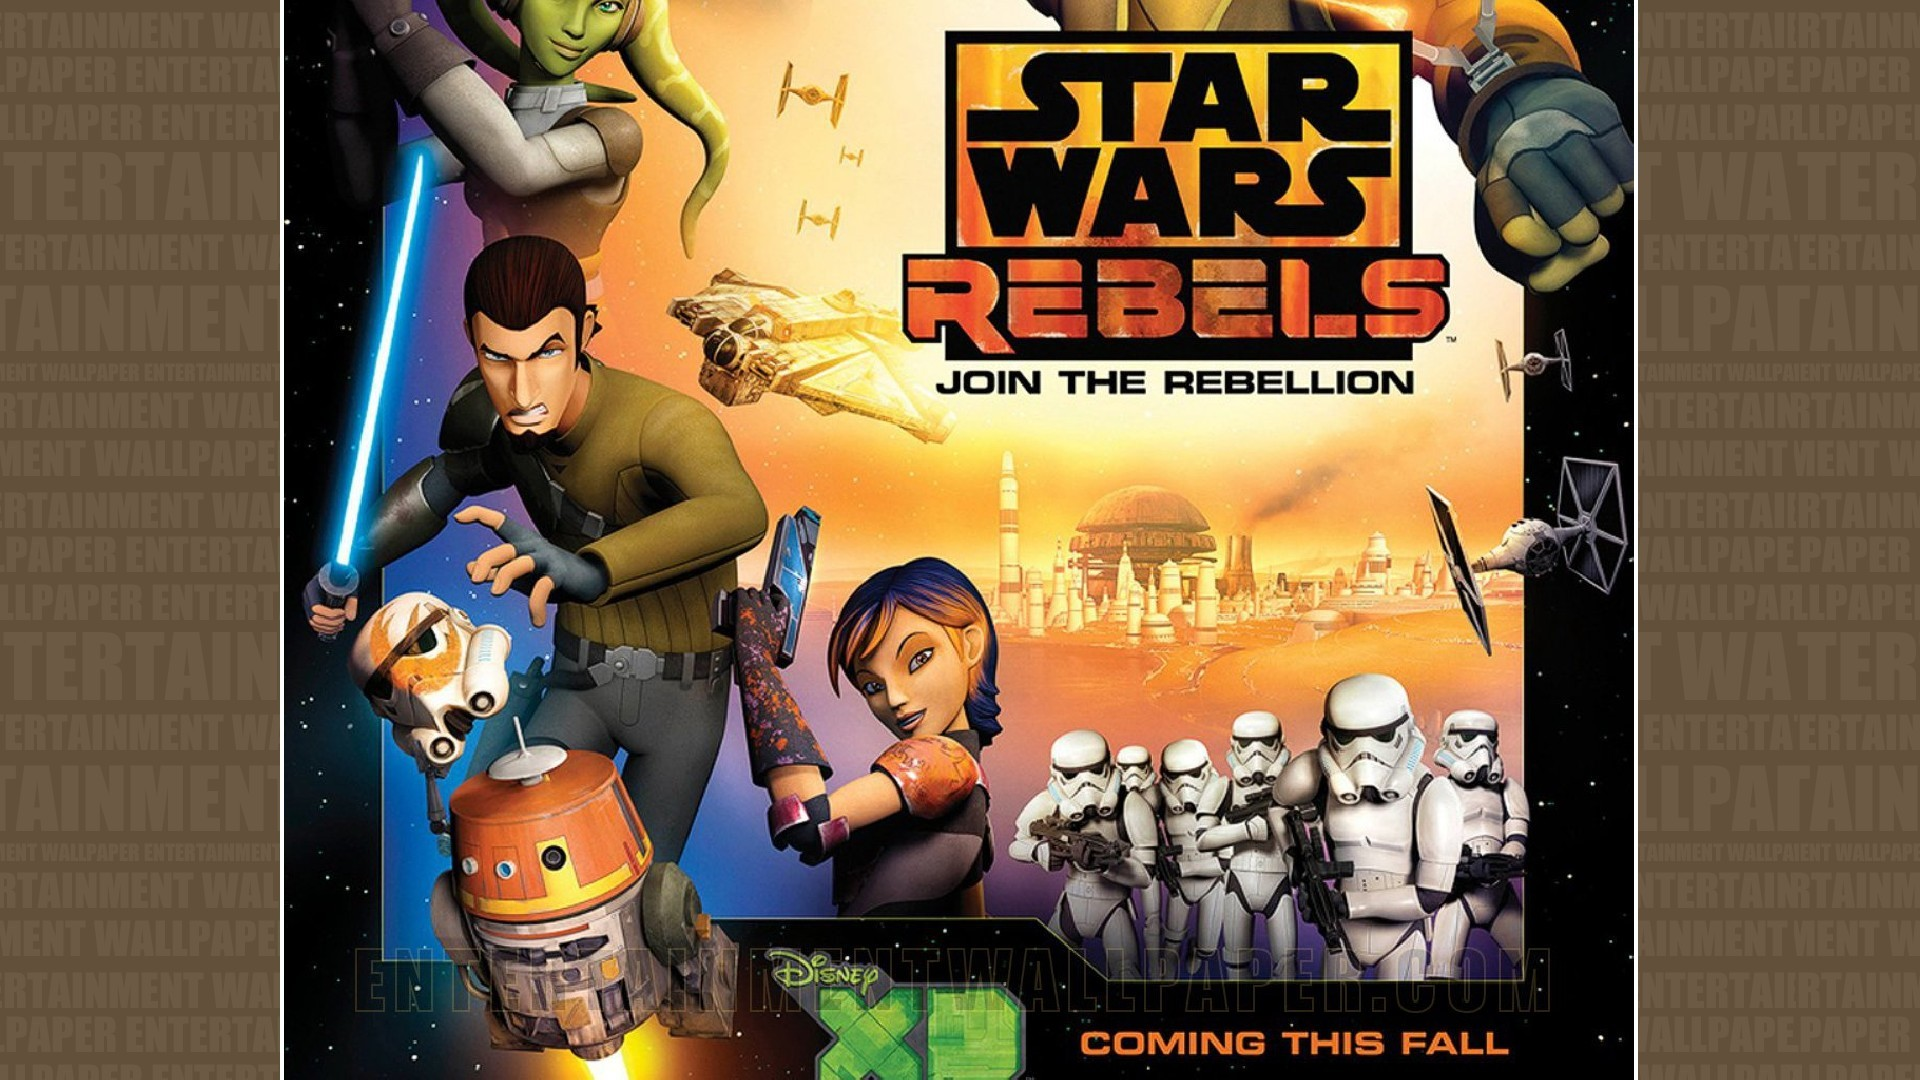 Star Wars Rebels Wallpaper – Original size, download now.